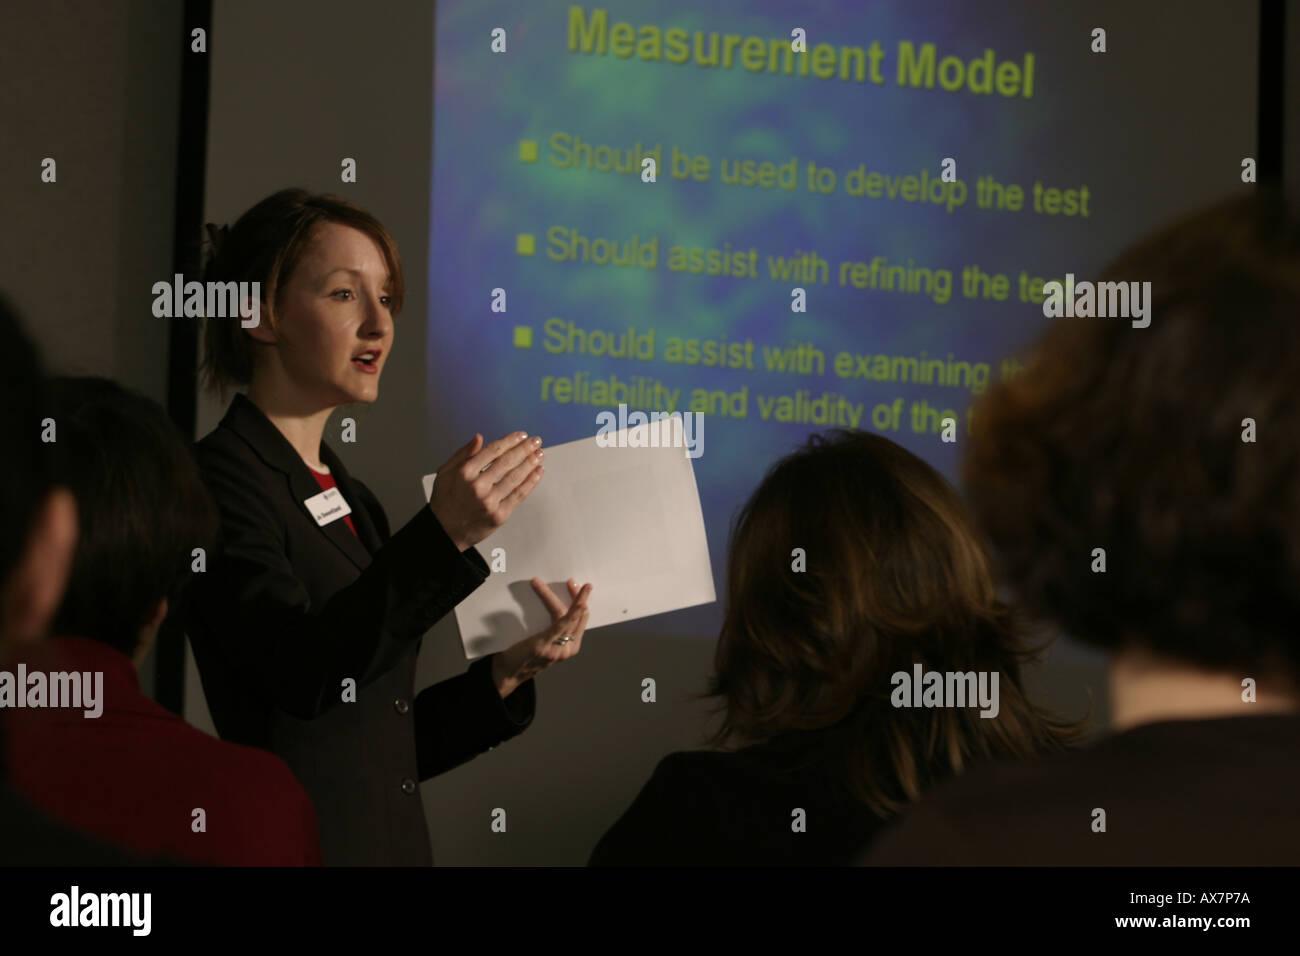 Presentation - Stock Image